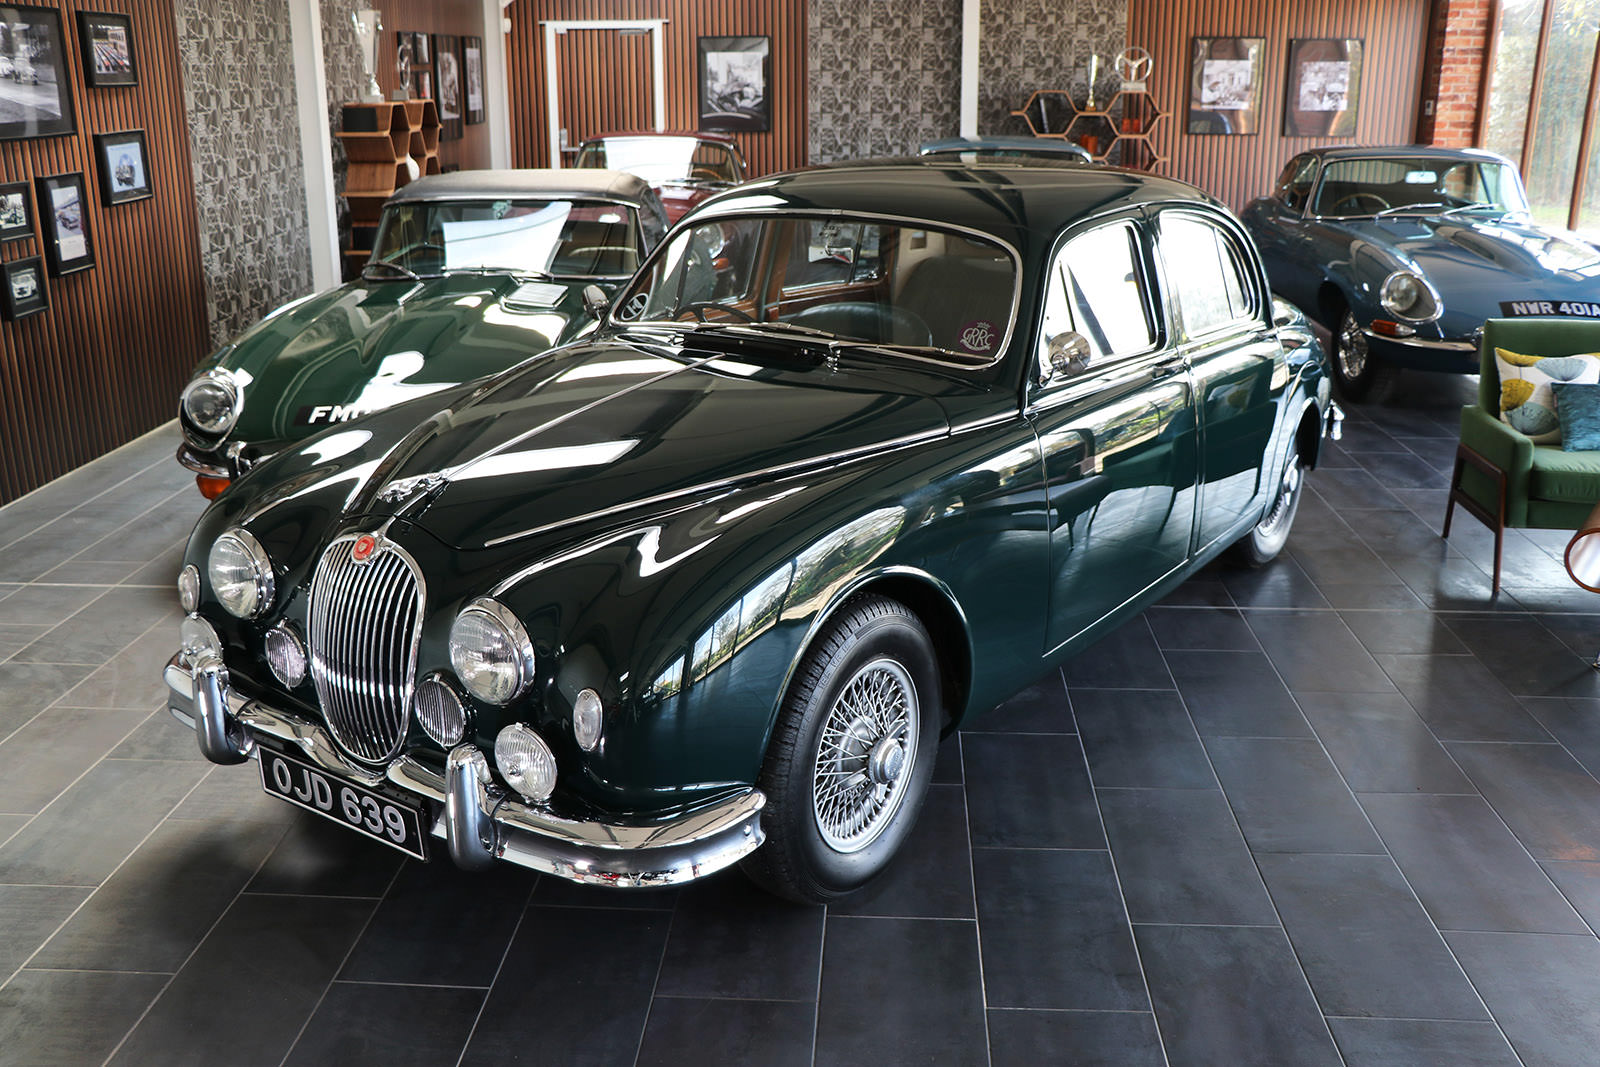 1959_Jaguar_Mark 1_sayer selection_duncan hamilton_lady cheatham_1_web.jpg